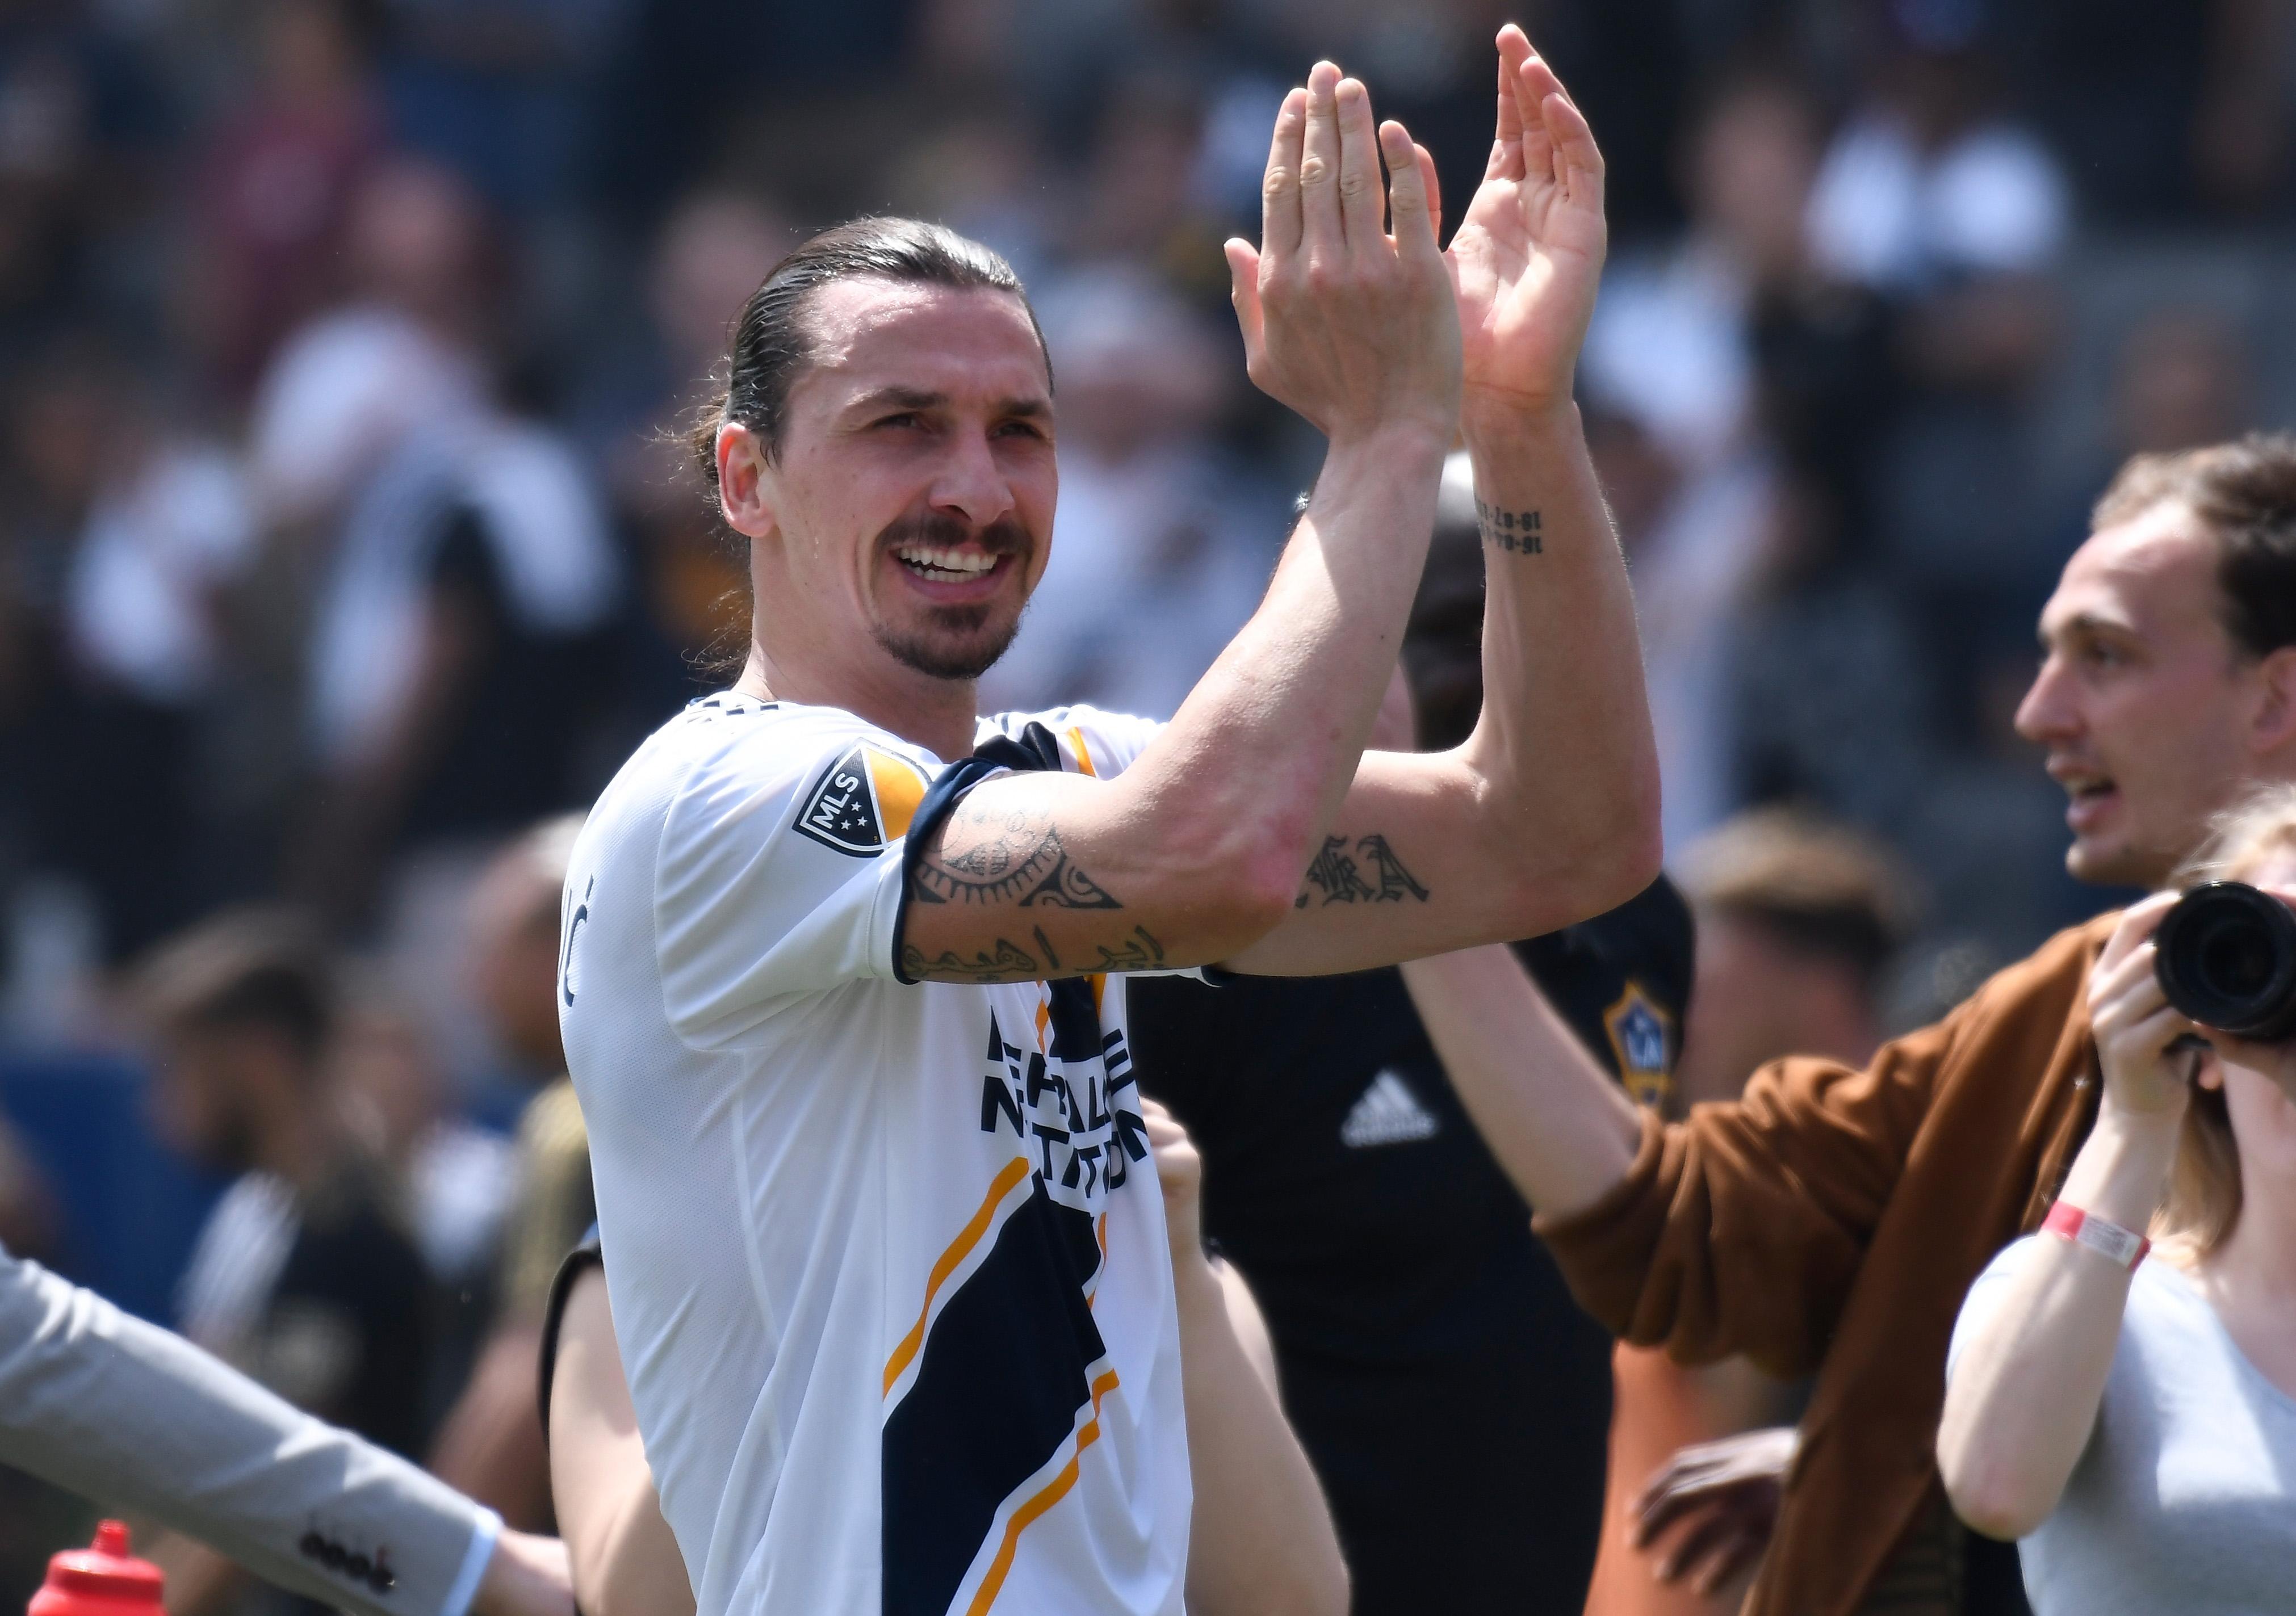 Football: Zlatan's dream Galaxy debut sends Sweden wild